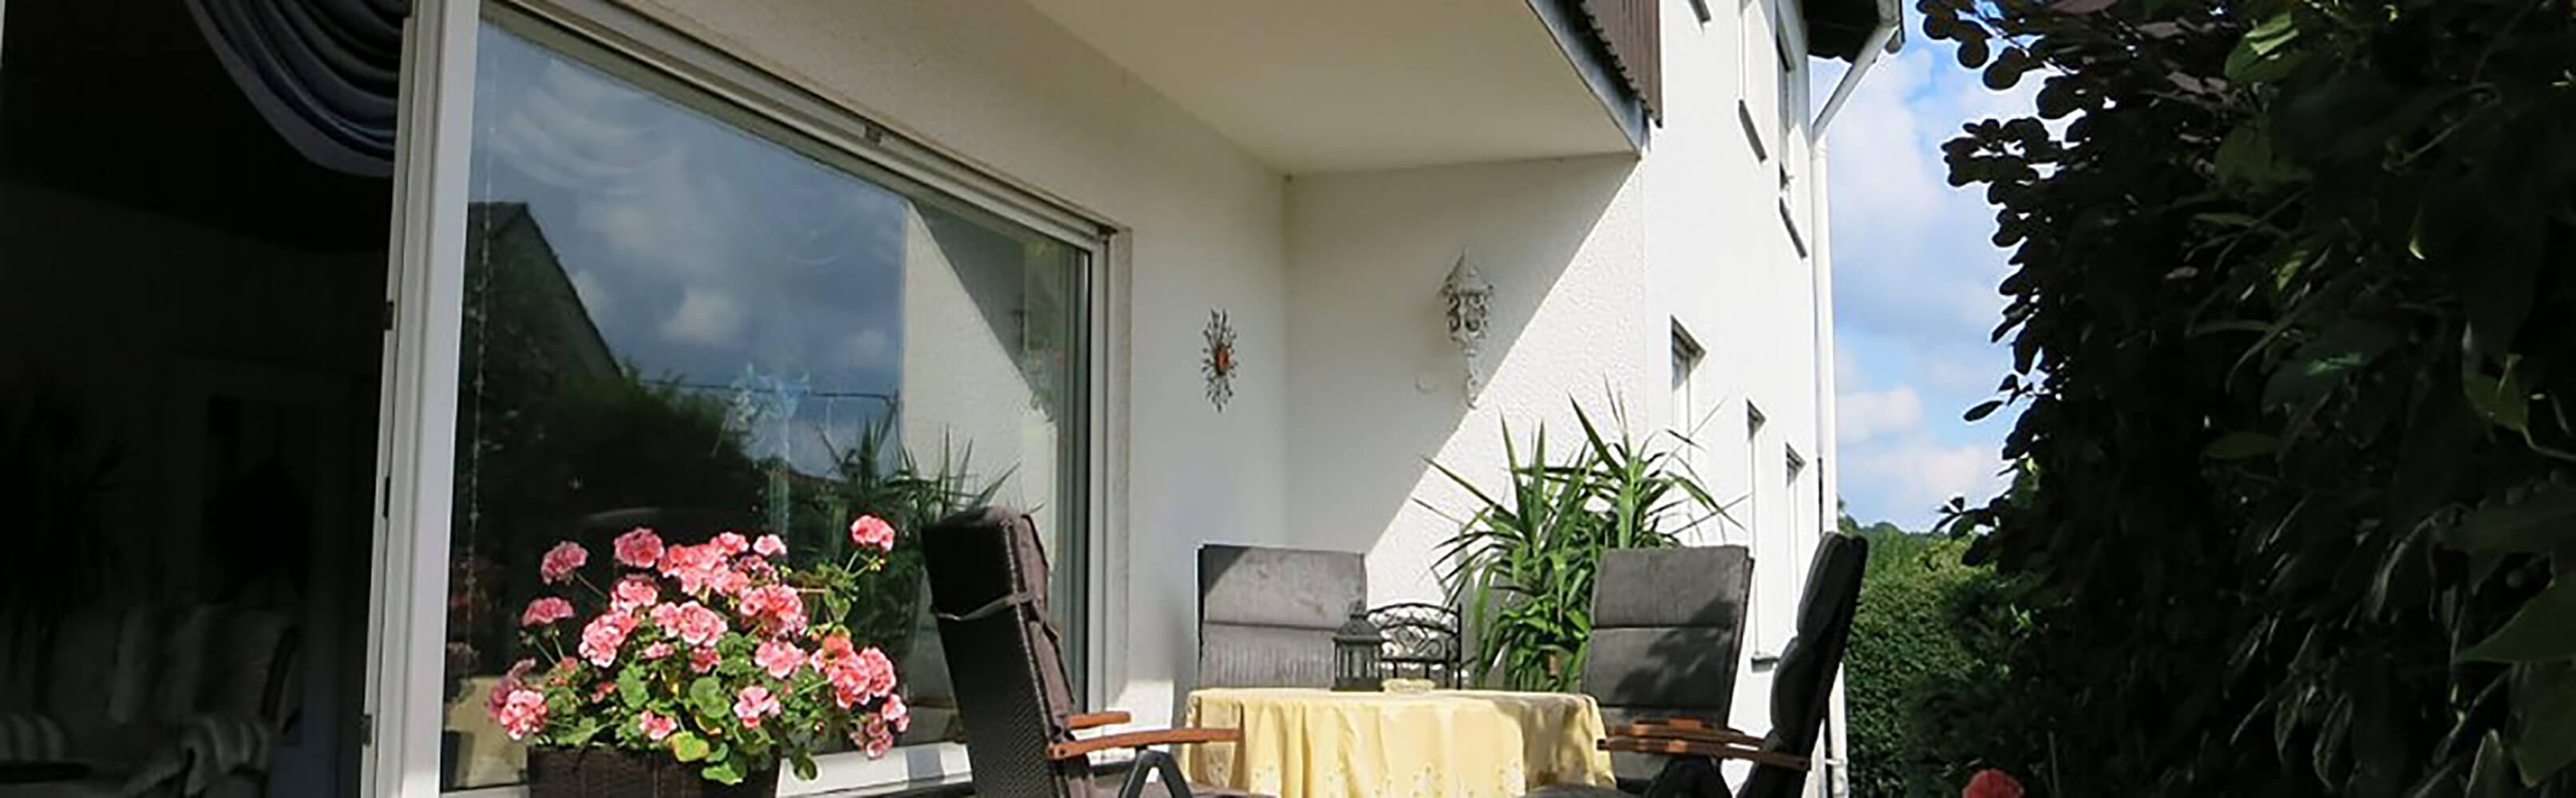 Ferienwohnung **** Am Bosenberg in St. Wendel, Nähe Bostalsee, Saarland 1